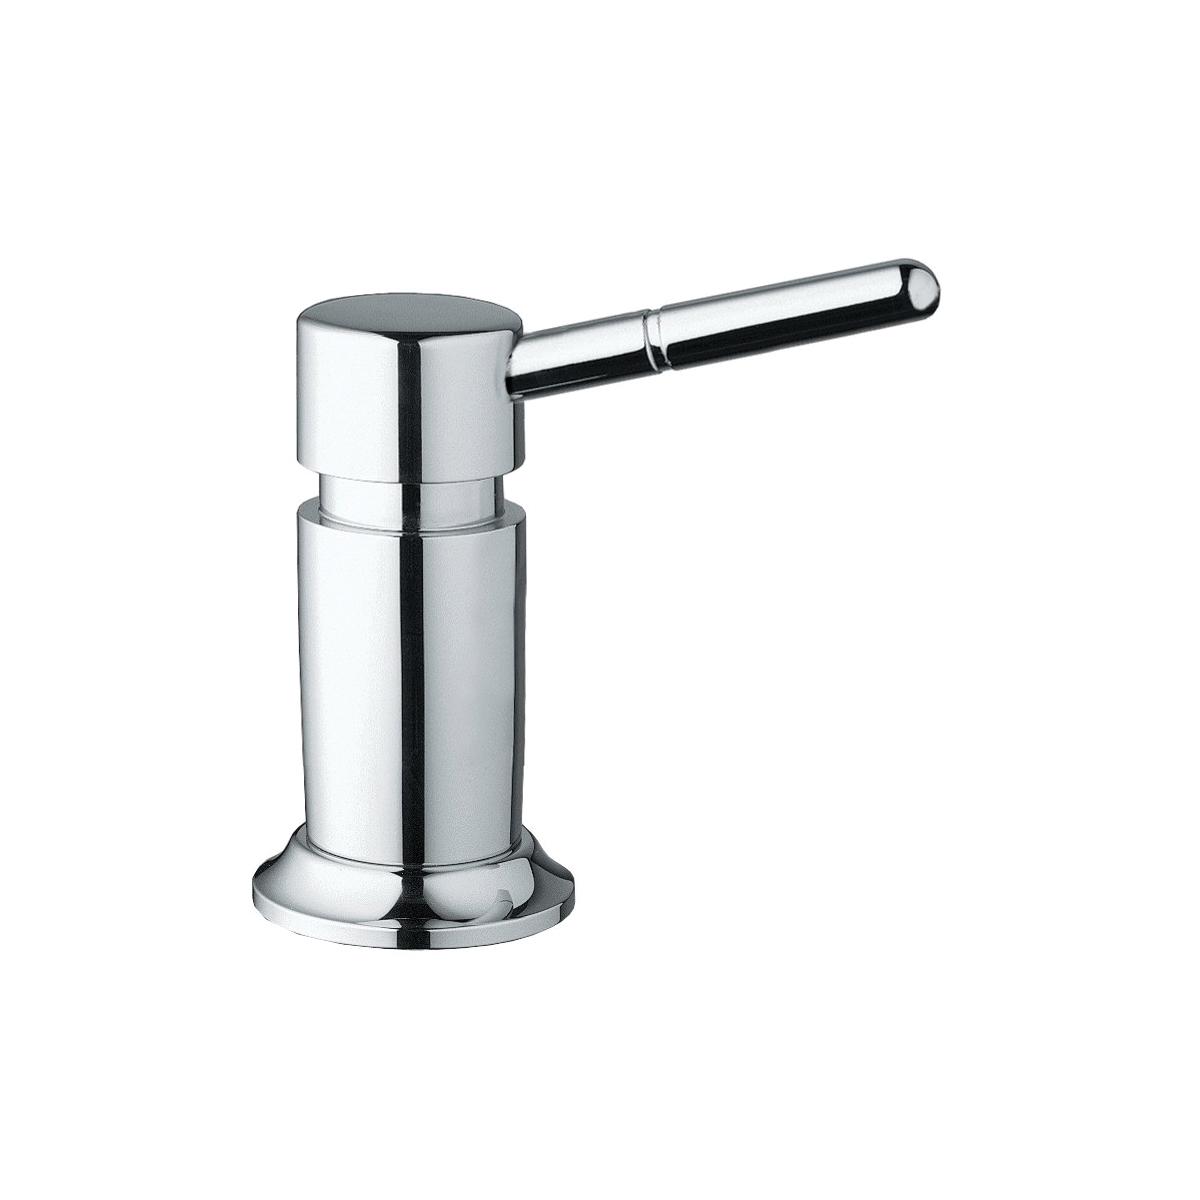 GROHE 28751001 DELUXE XL Soap Dispenser, 15 oz, Deck Mount, Brass, StarLight® Chrome